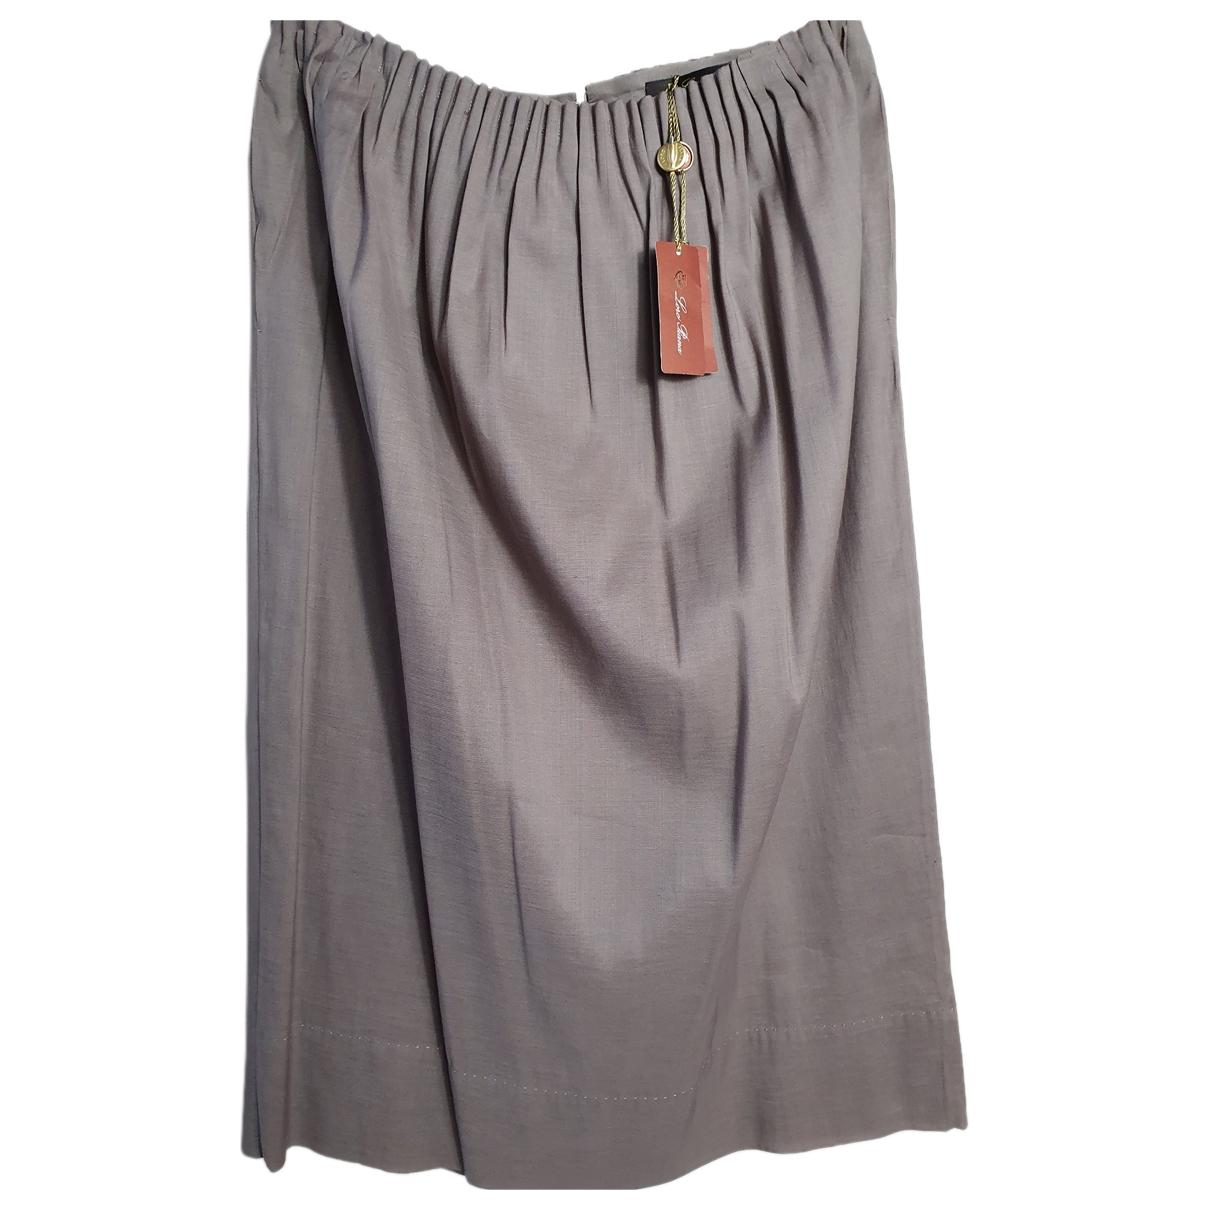 Loro Piana - Jupe   pour femme en soie - beige